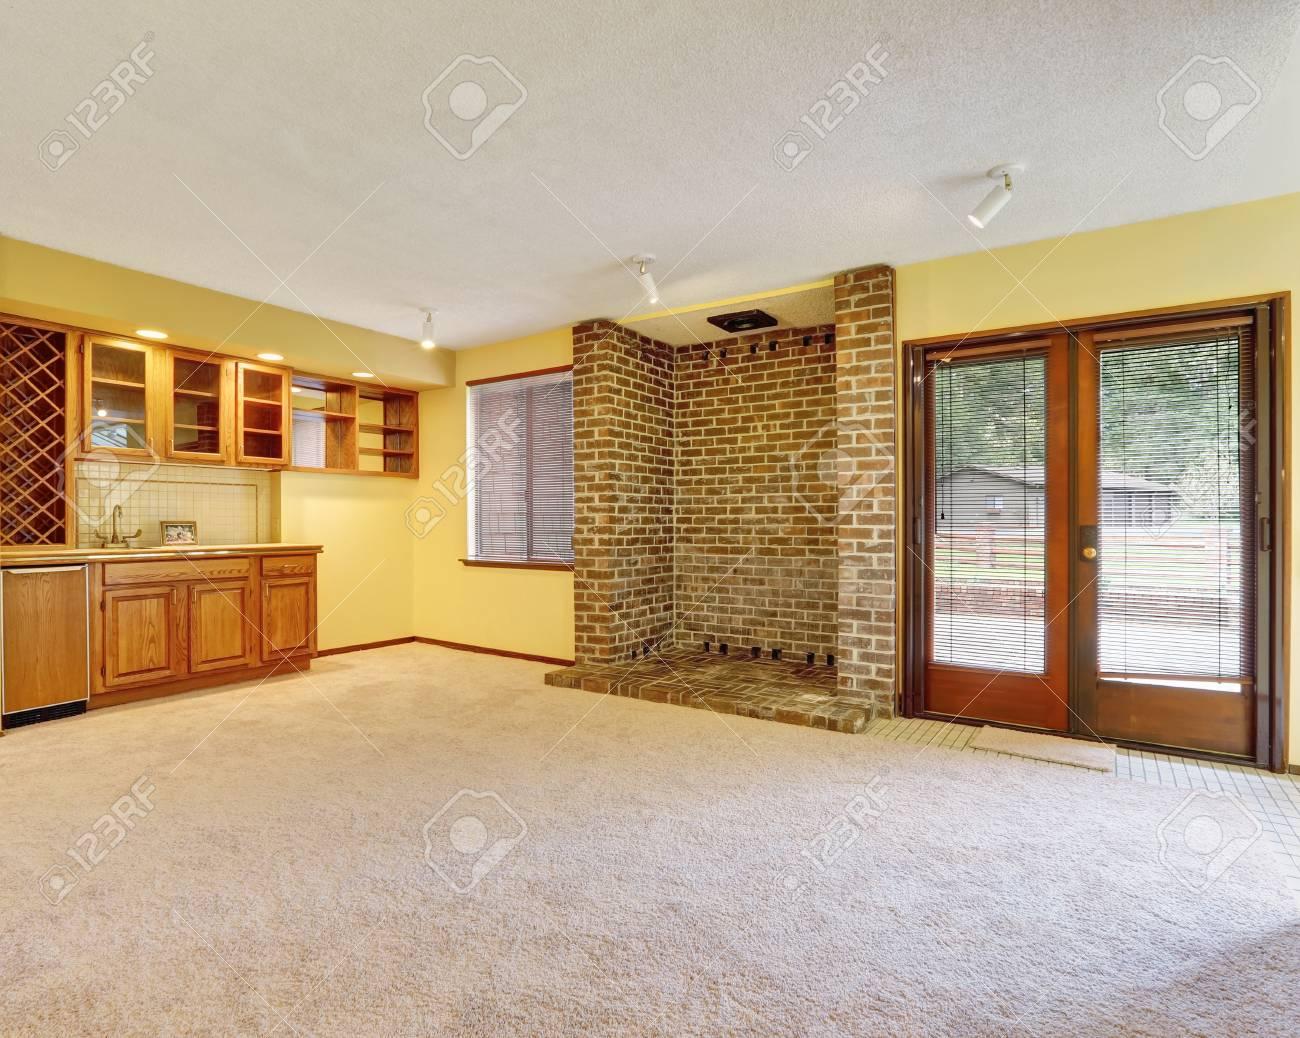 empty family room interior with soft yellow walls ready niche rh 123rf com Laundry Room Empty Creepy Empty Room